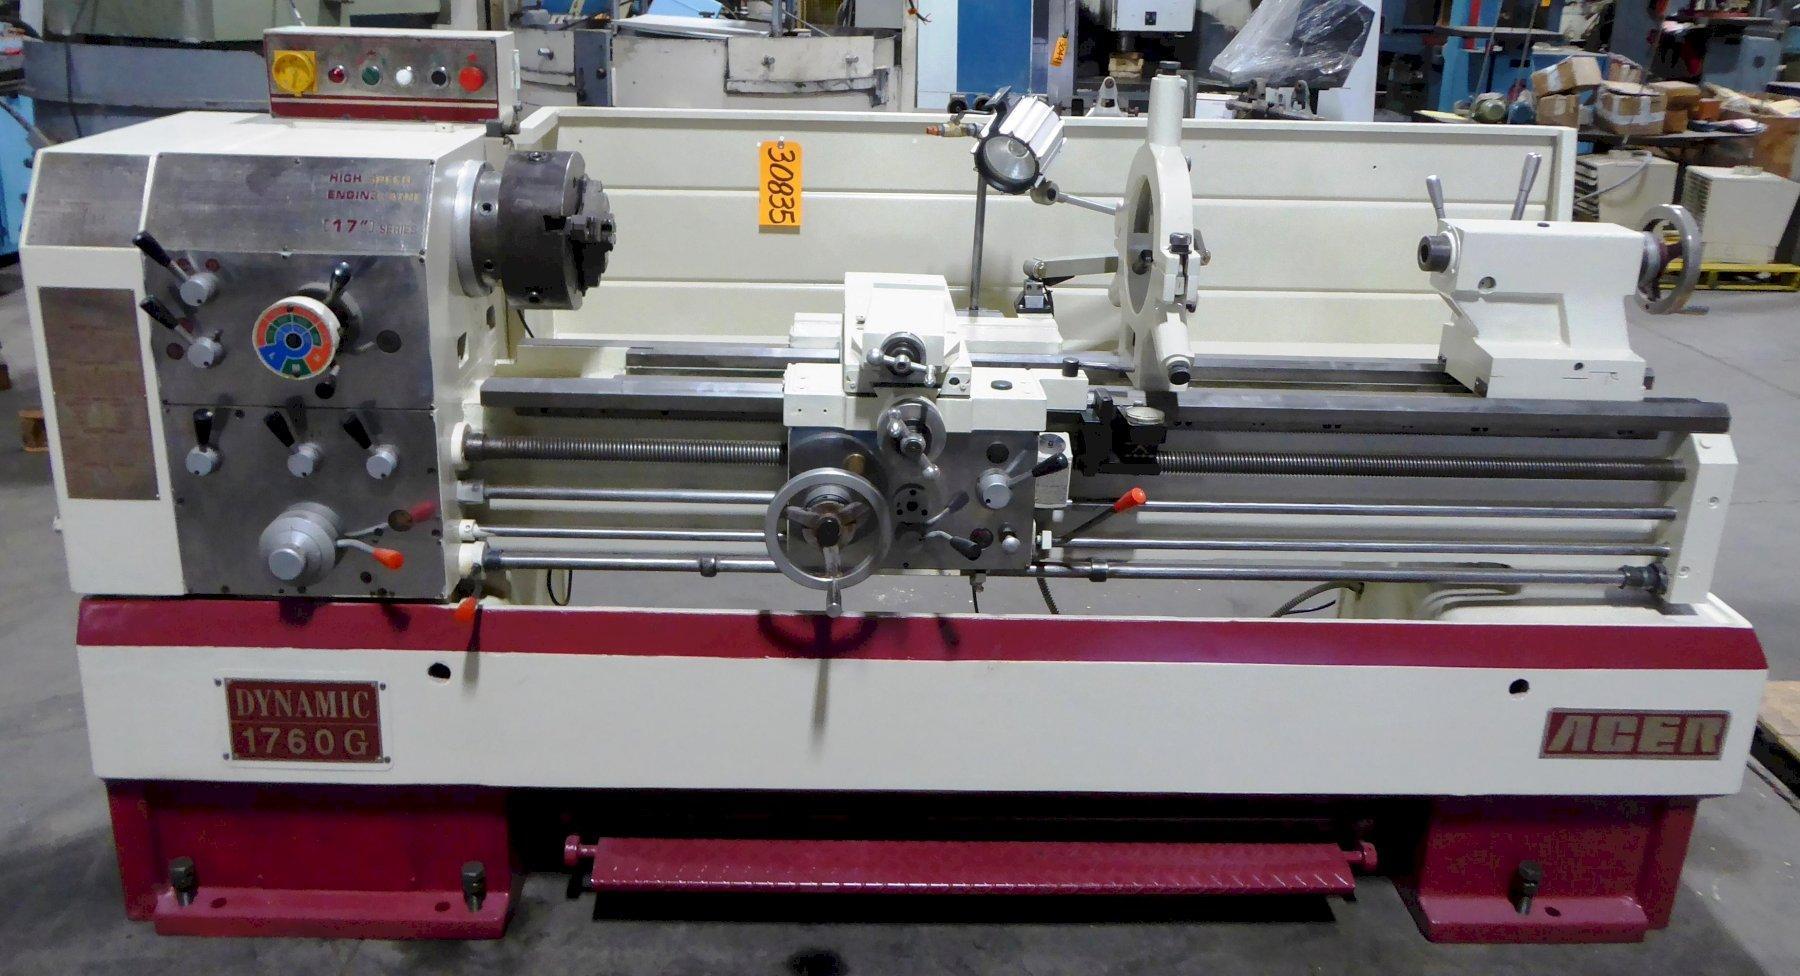 "17""/26"" x 60"" ACER Gap Bed Lathe No. 1760G, Gap, 50-1800 RPM, Inch/mm, S.R.,  Clean"